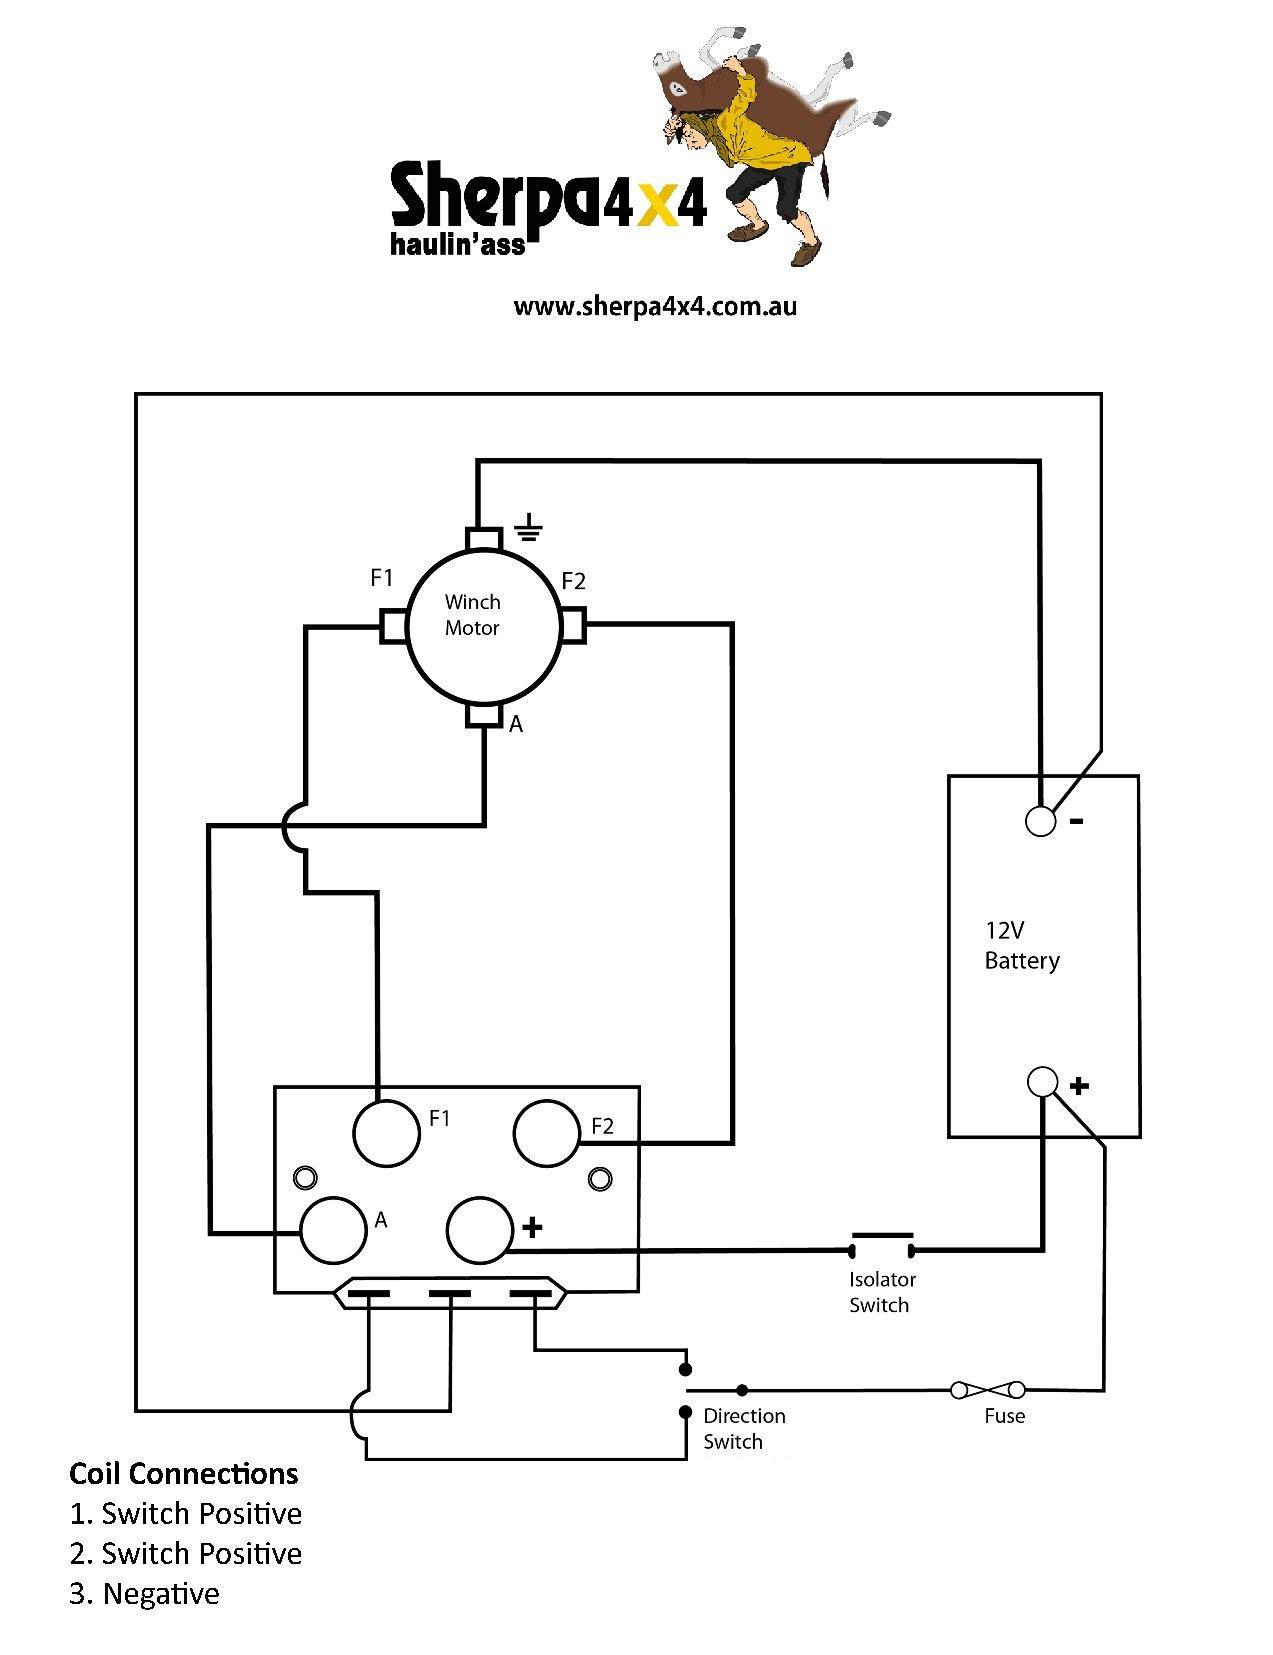 dv_2871] tabor winch wiring diagram also warn winch solenoid ... 12v winch solenoid wiring diagram  sarc basi pneu coun boapu mohammedshrine librar wiring 101